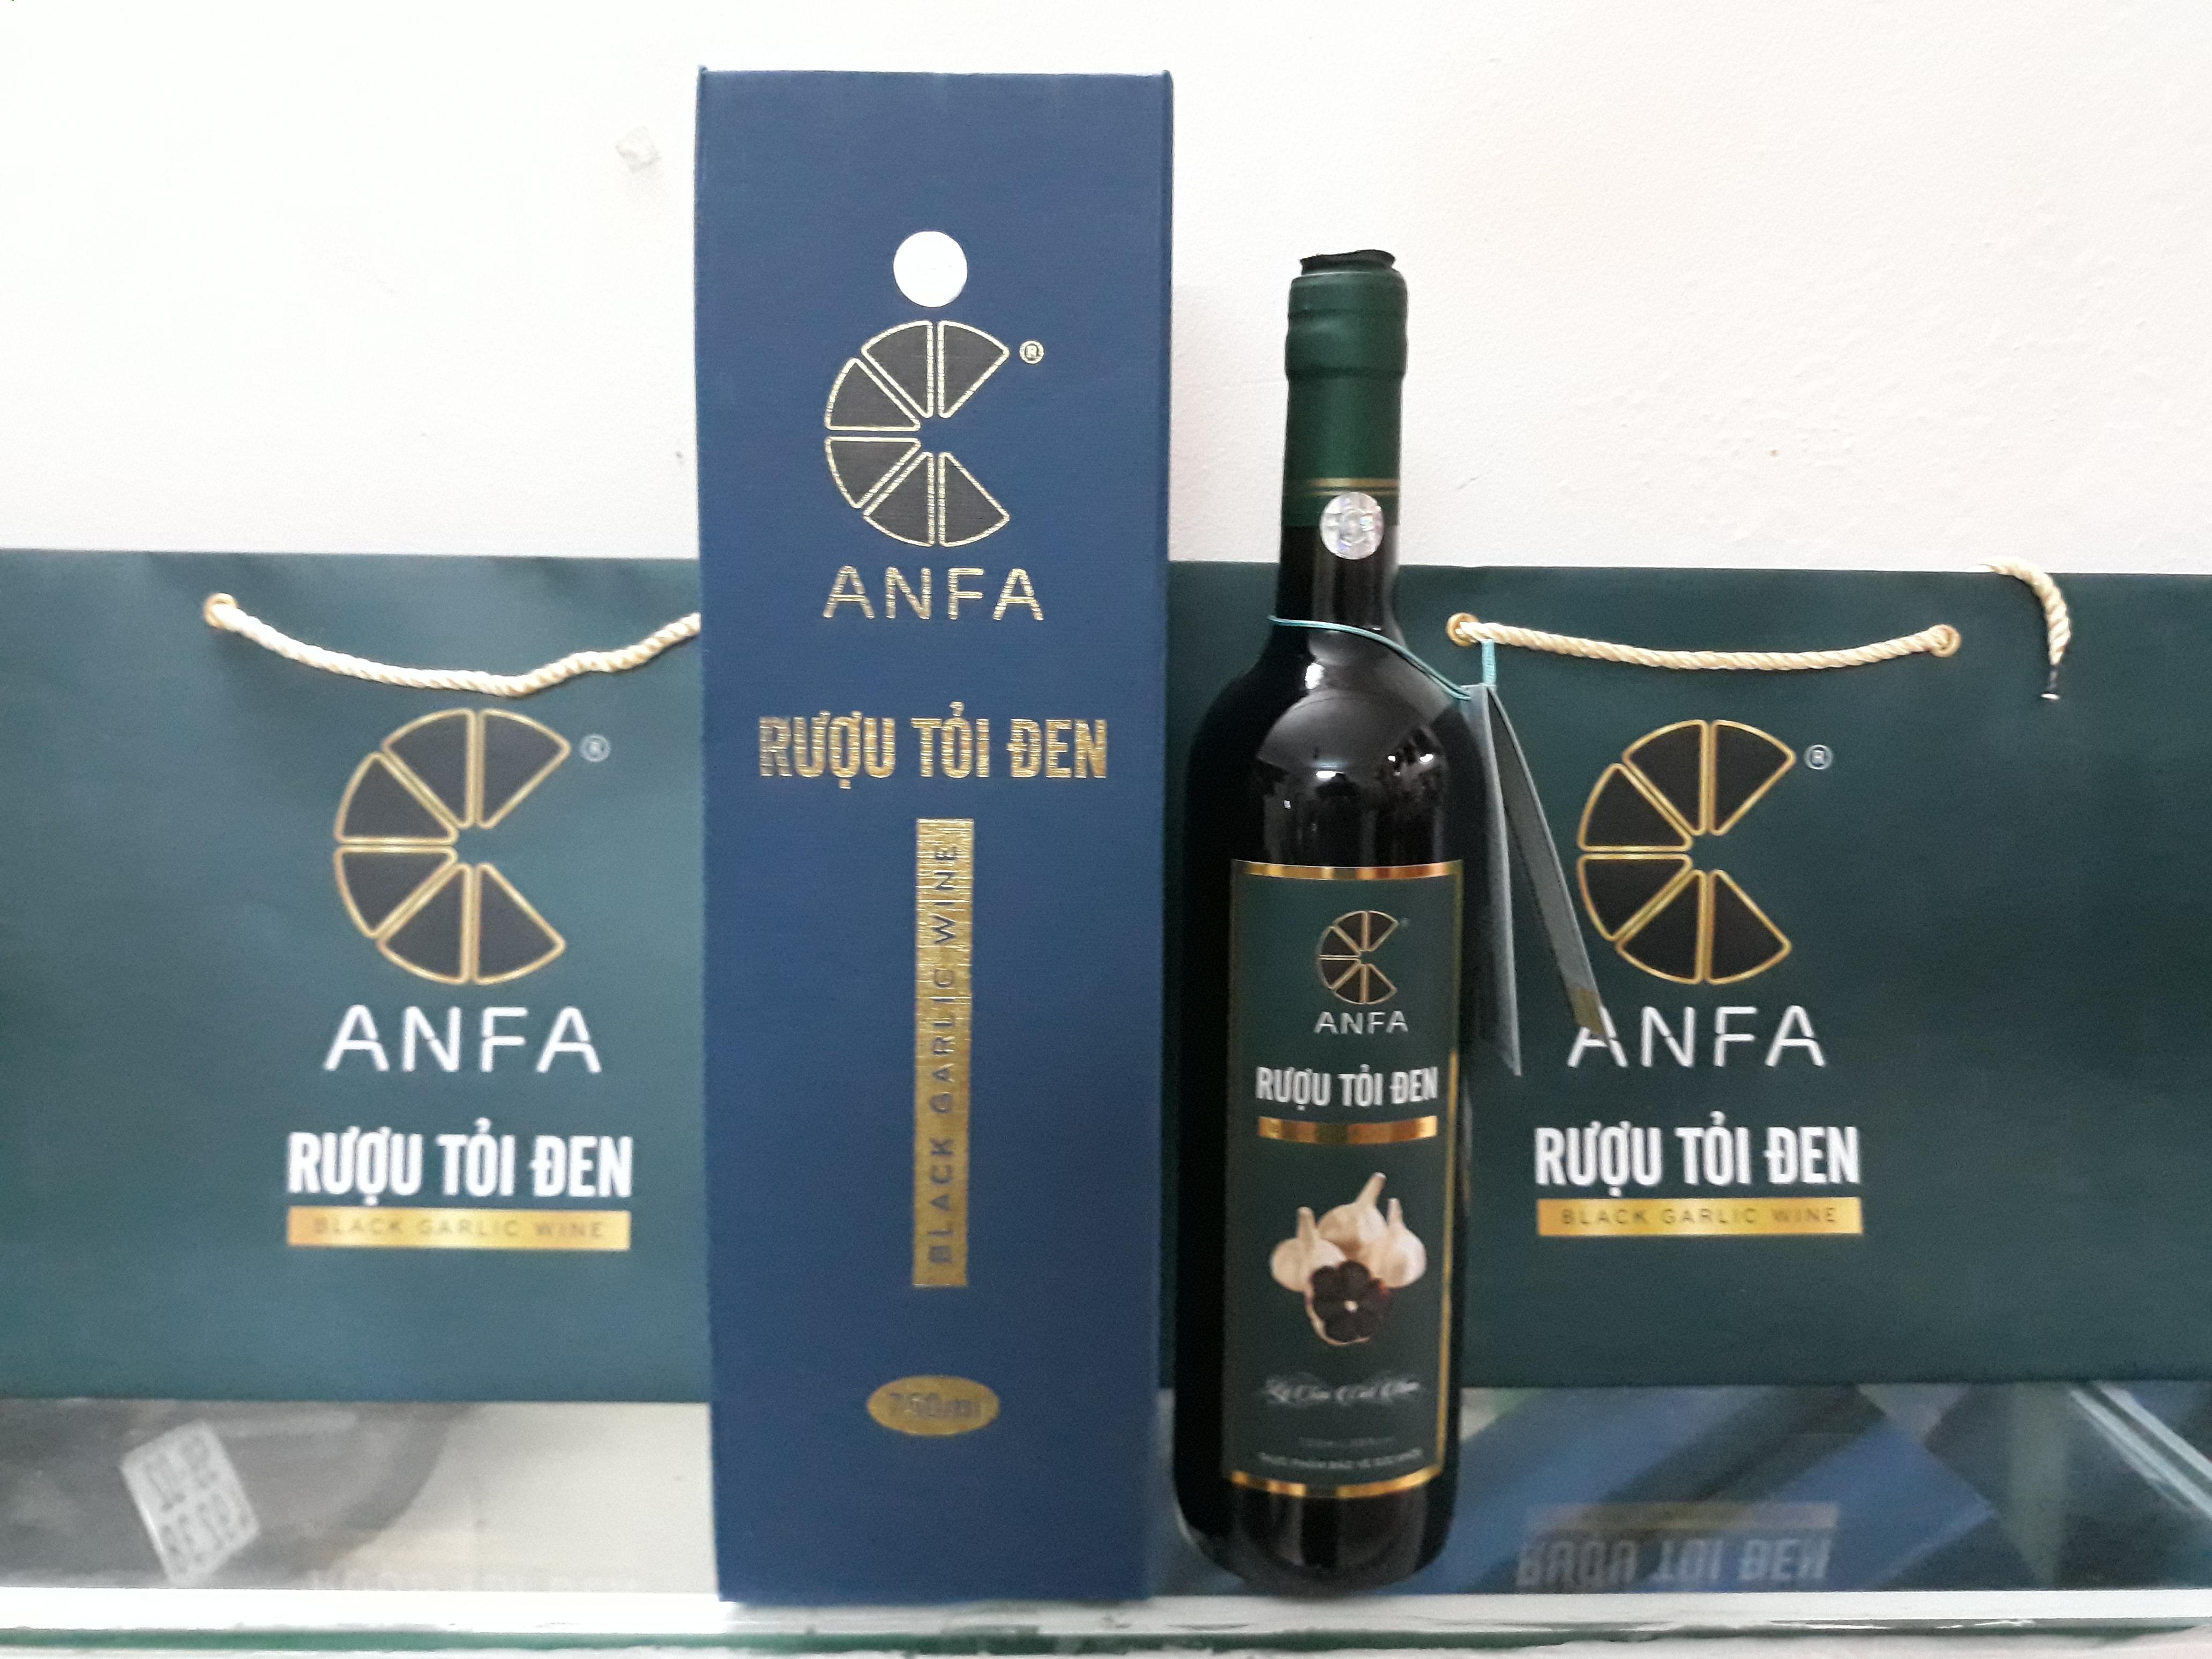 Rượu Tỏi Đen Anfa 750ml